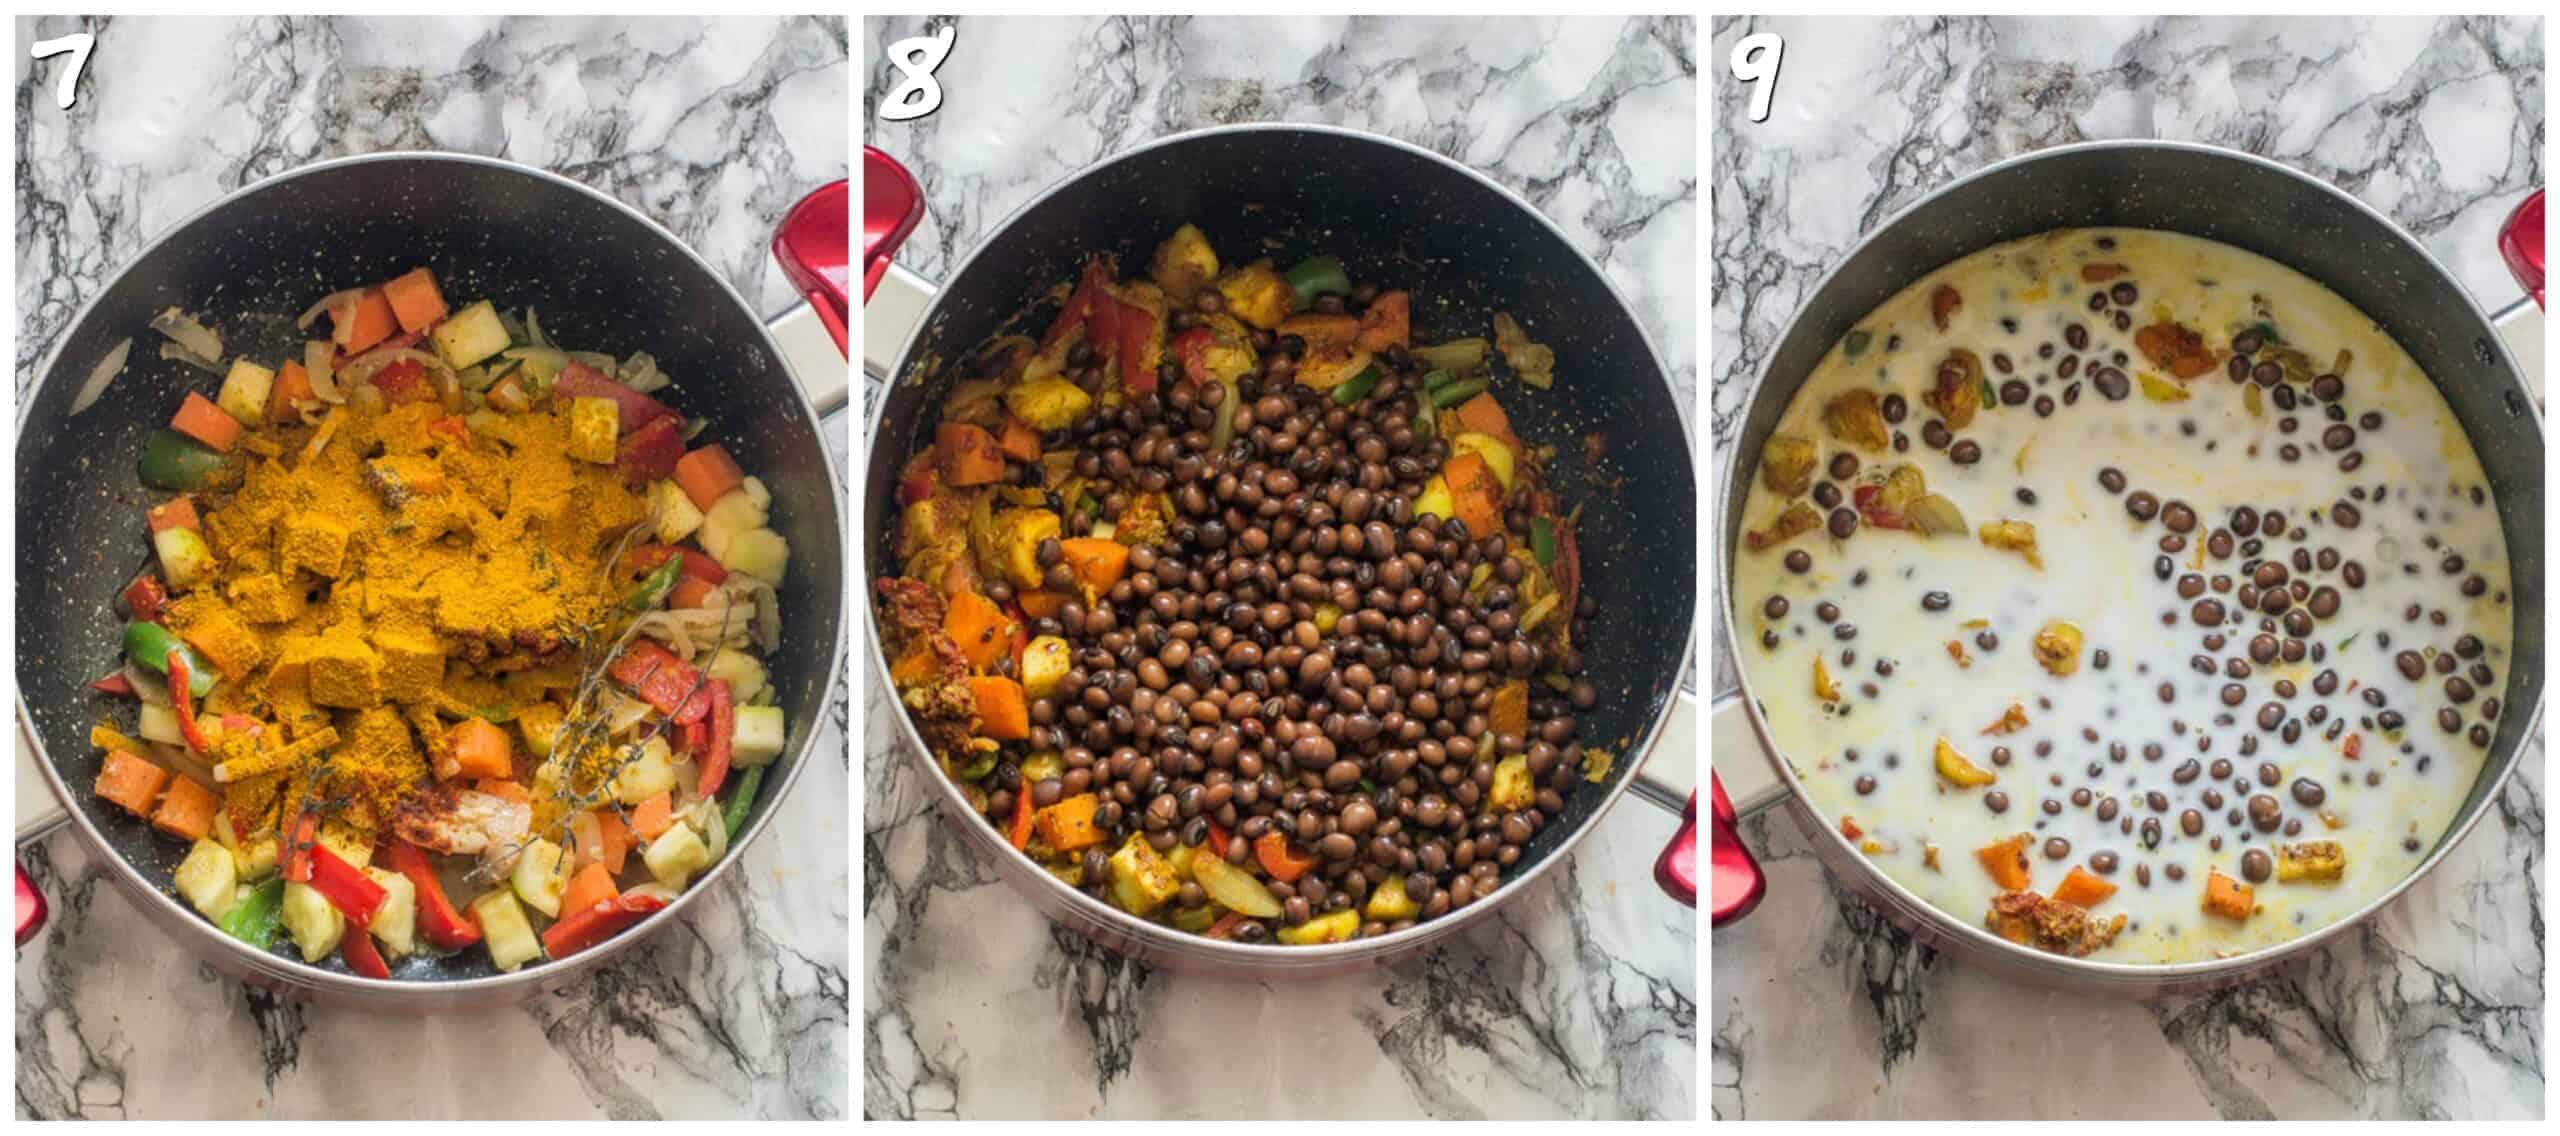 steps 7-9 adding peas and coconut milk